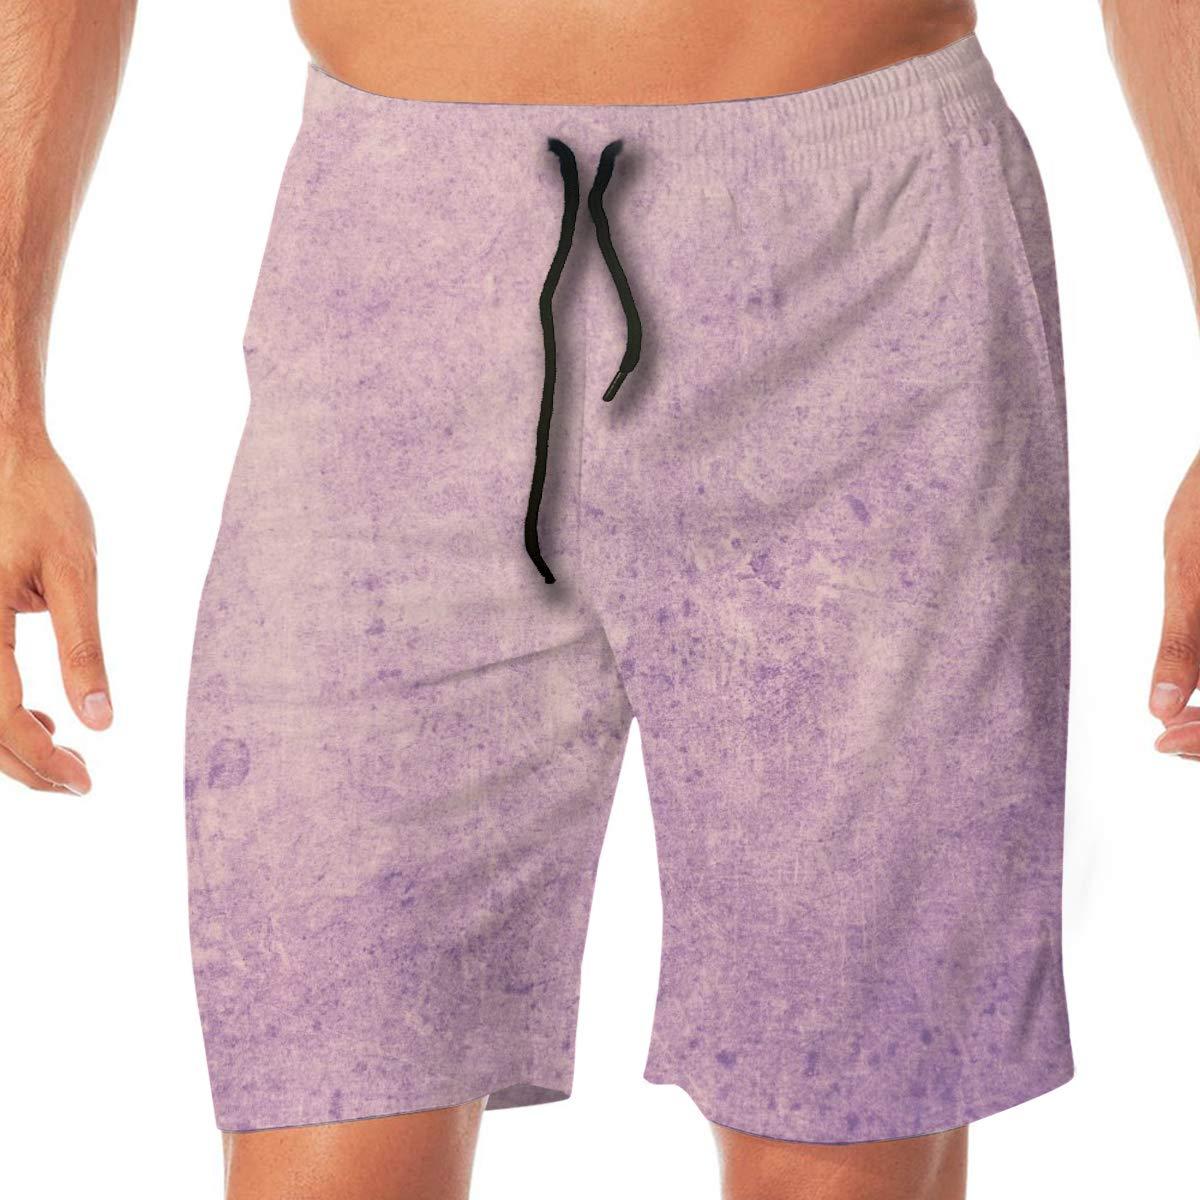 Cbyan Beach Briefs Men Swimwear Shorts Swimming Short with Mesh Lining M L XL XXL